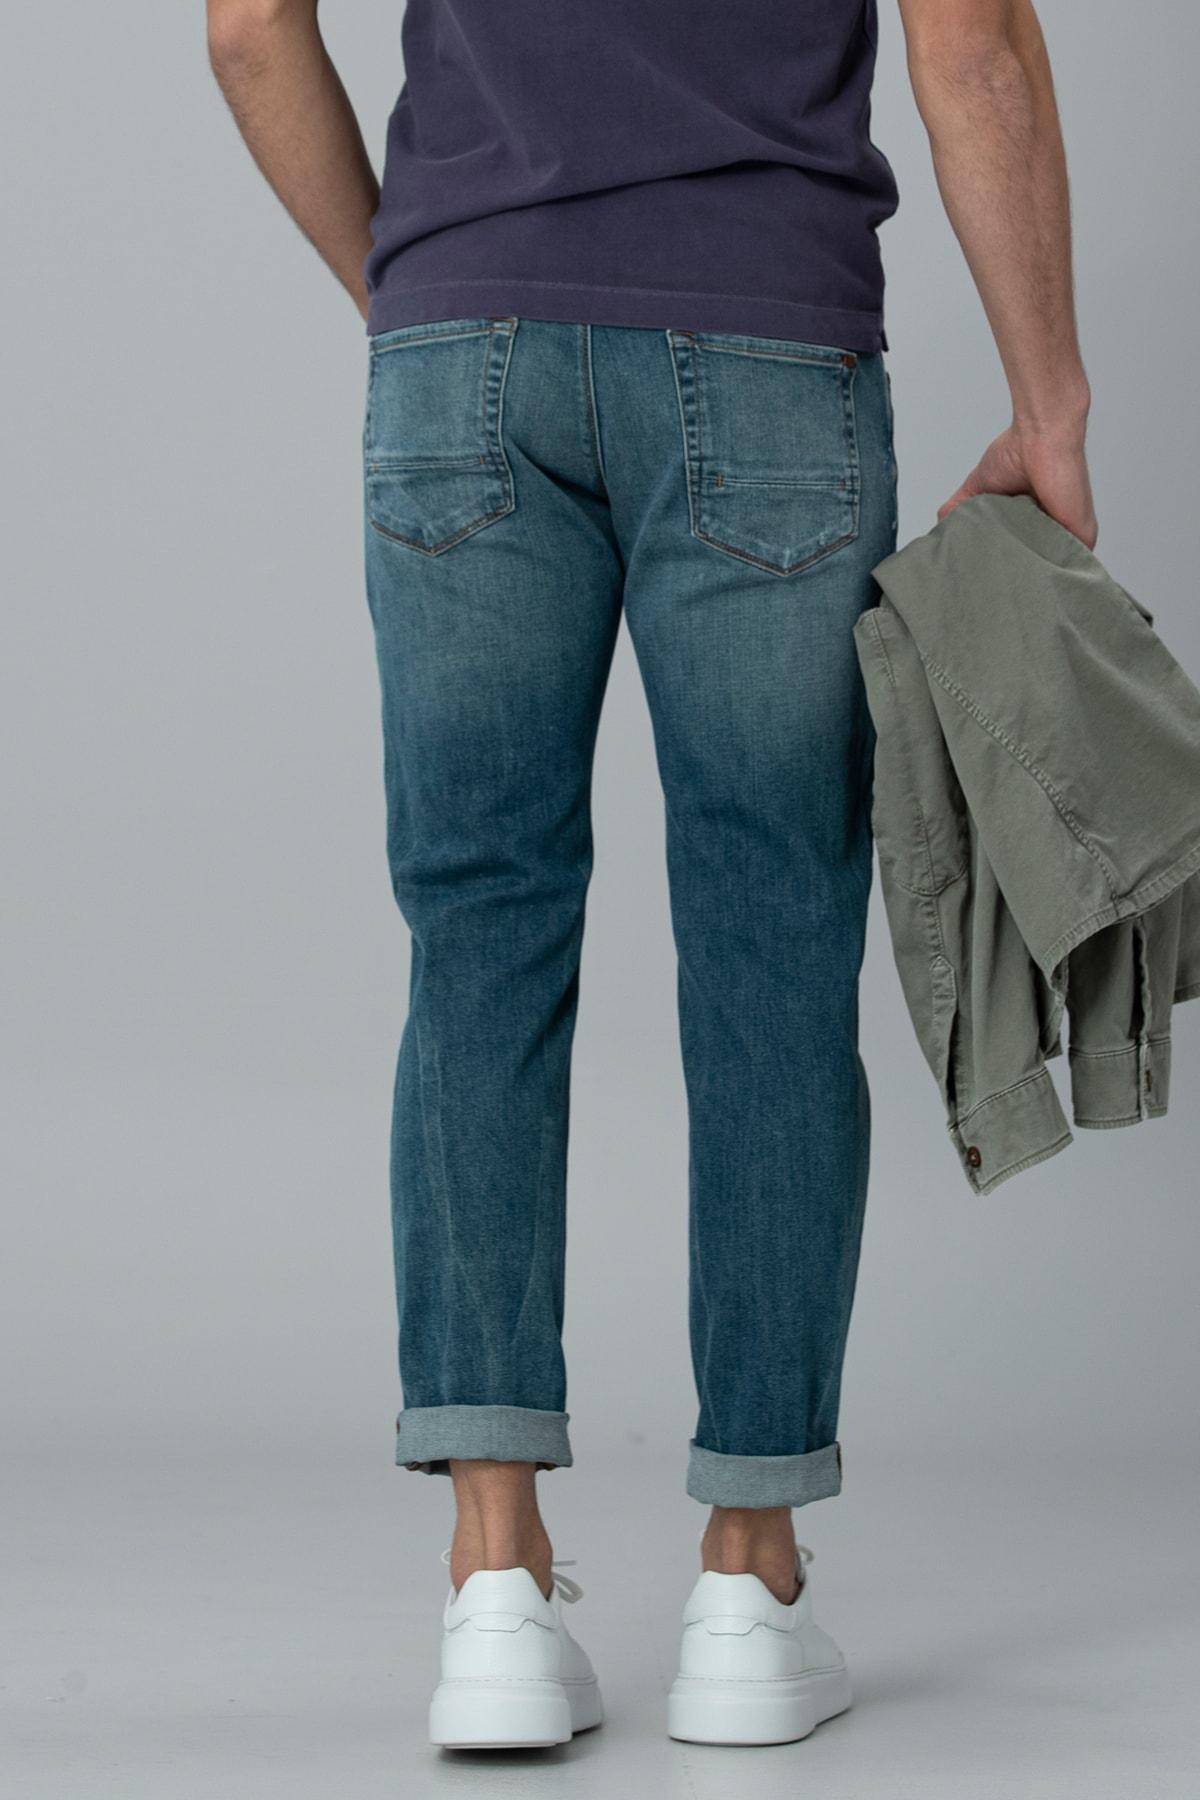 Lufian Geny Smart Jean Pantolon Slim Fit Açık Mavi 4